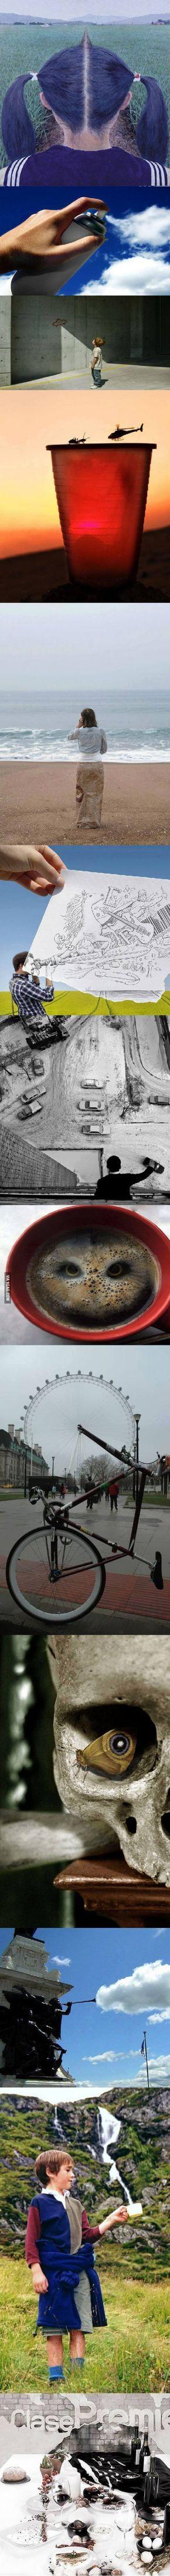 Amazing photo illusions                                                                                                                                                                                 More